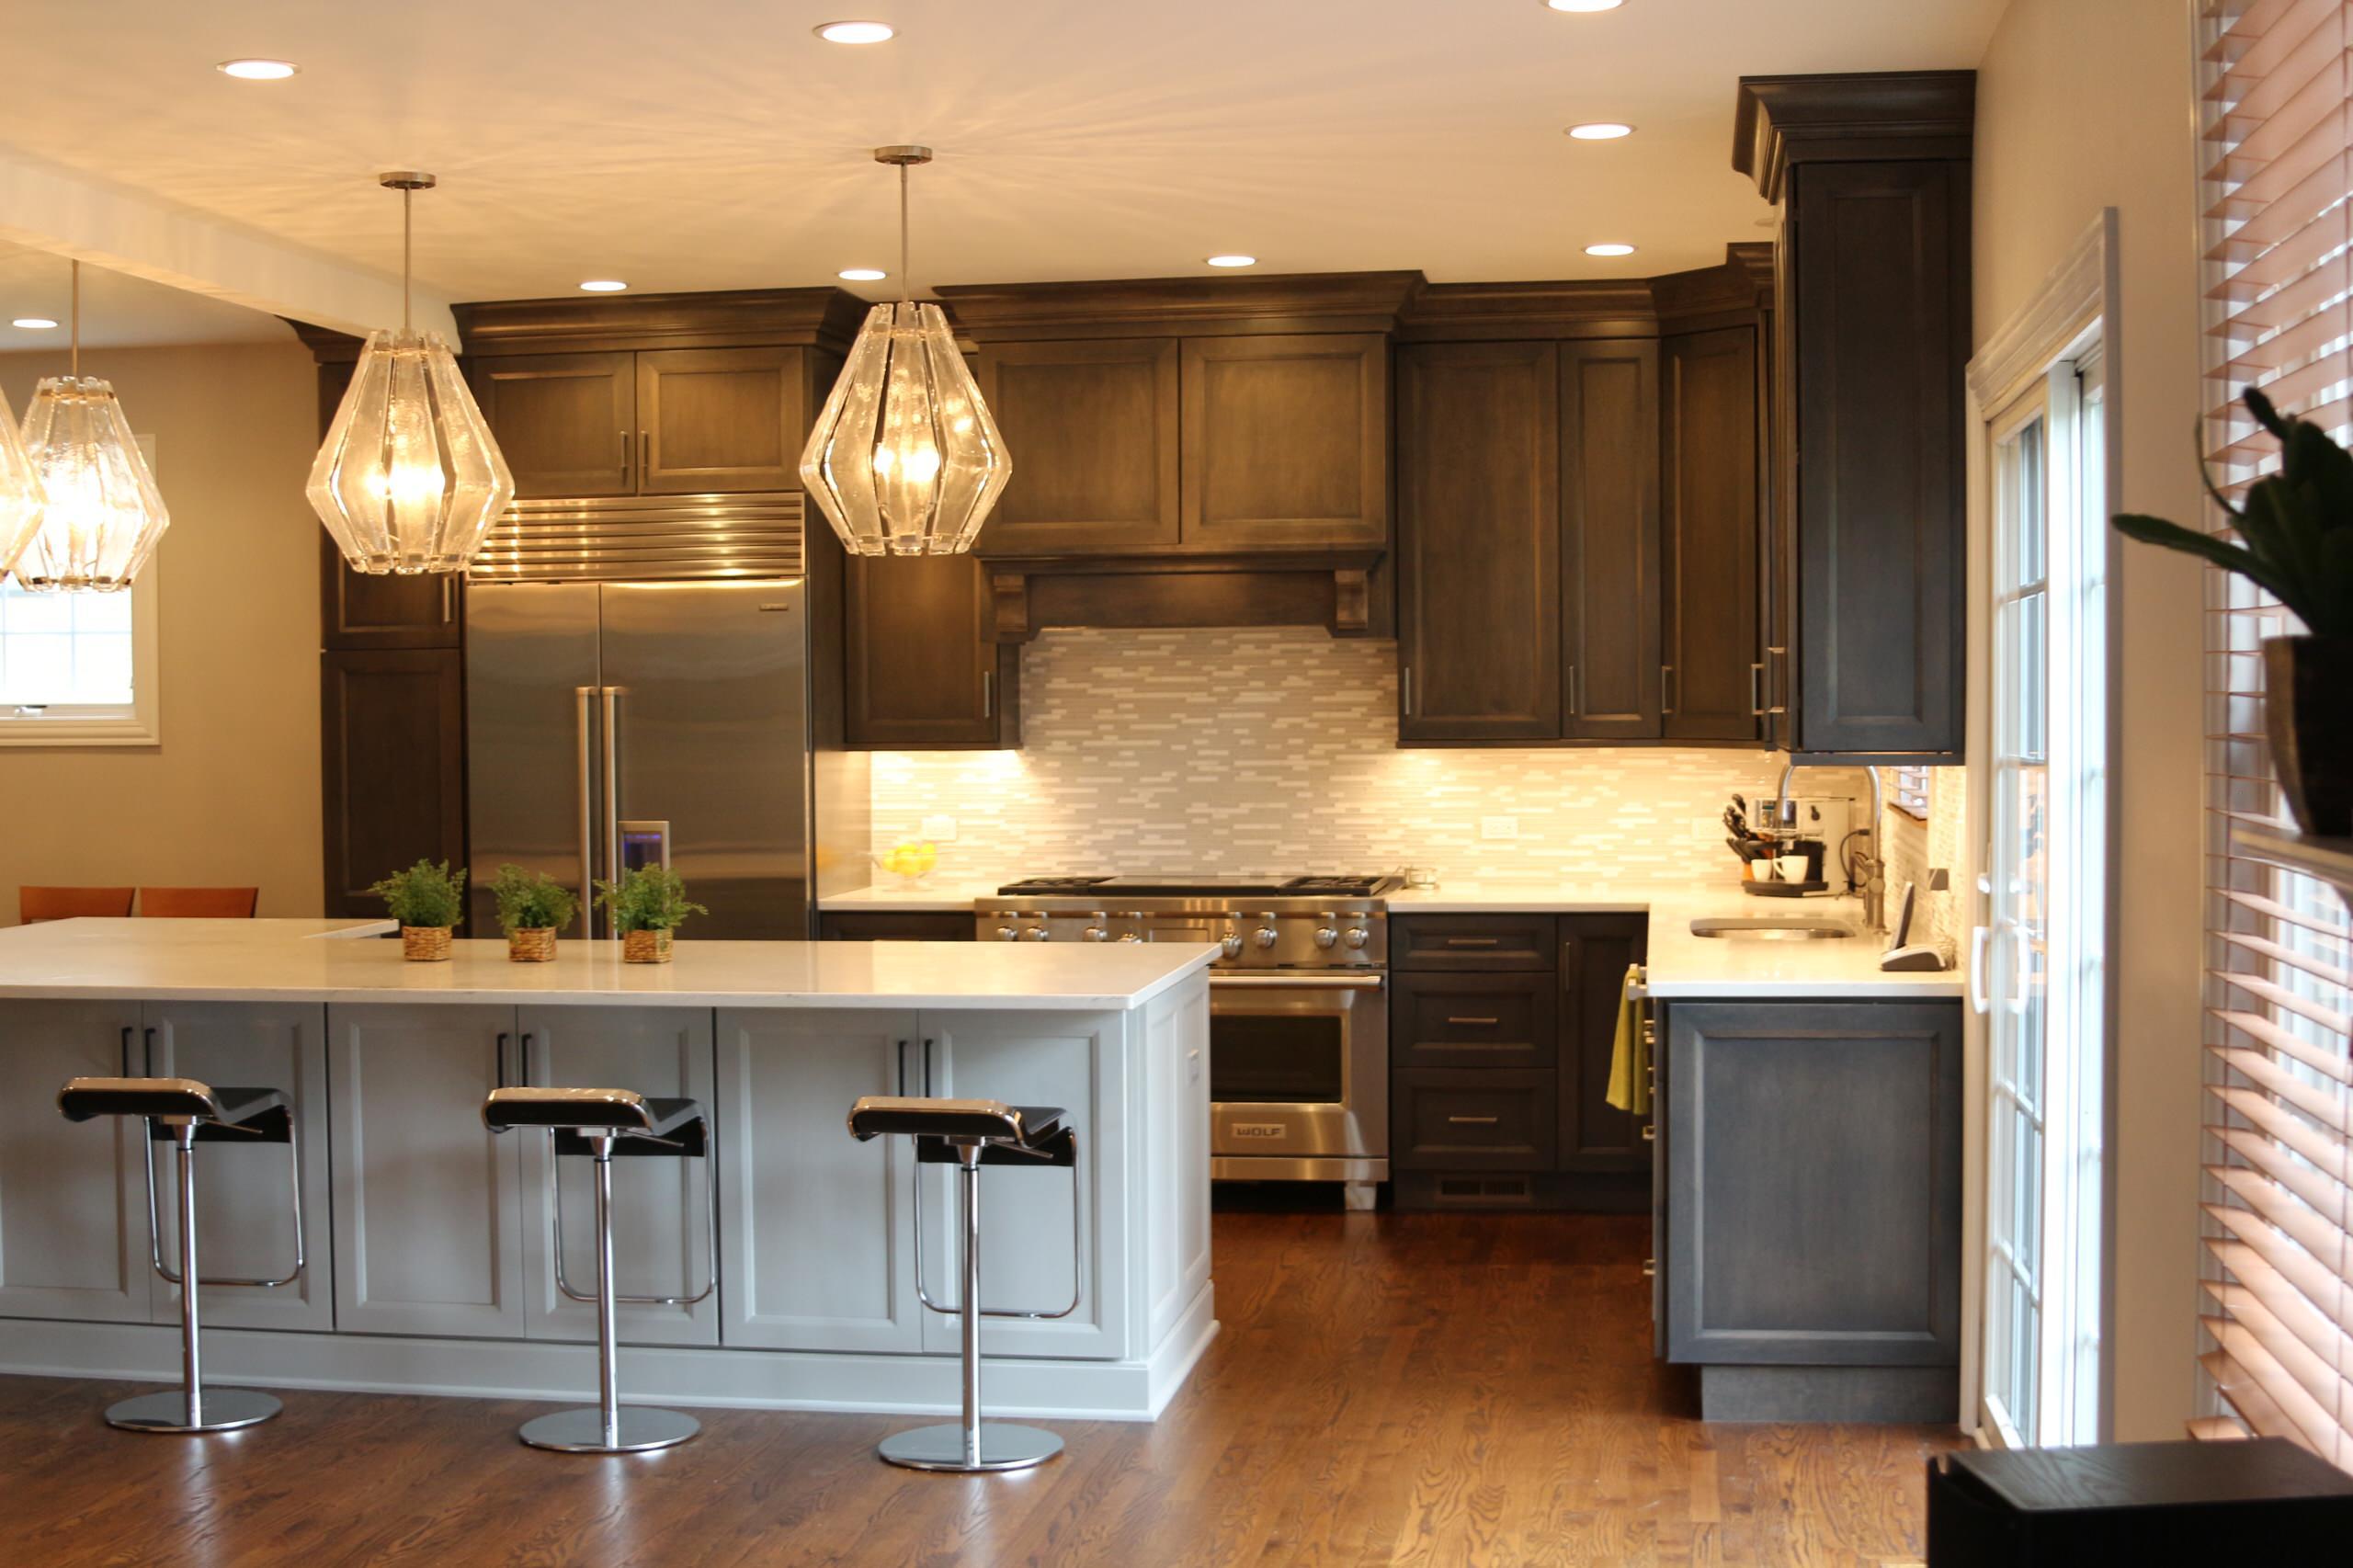 Highland Park - Major Kitchen Overhaul